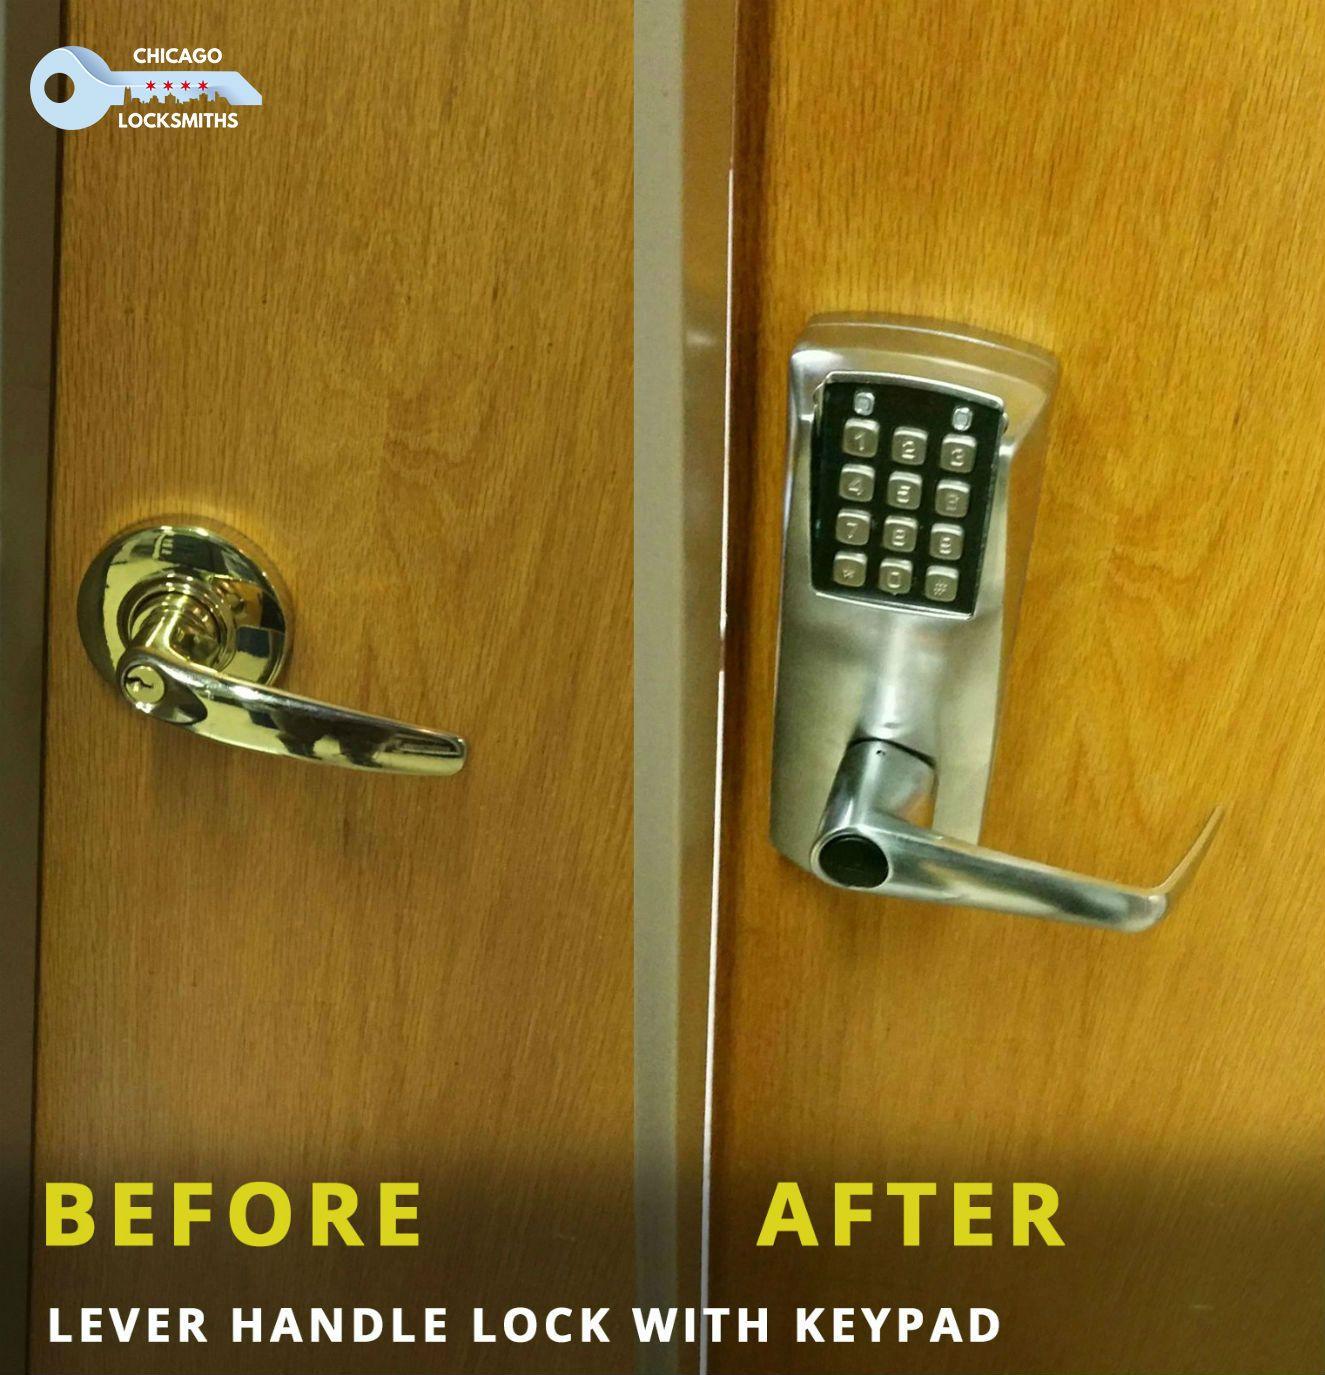 Keypad Lock Installation Done By Chicago Locksmiths Chicago Locksmith 24hourlocksmith Locksmithinchicago Securit Locksmith Locksmith Services Keypad Lock